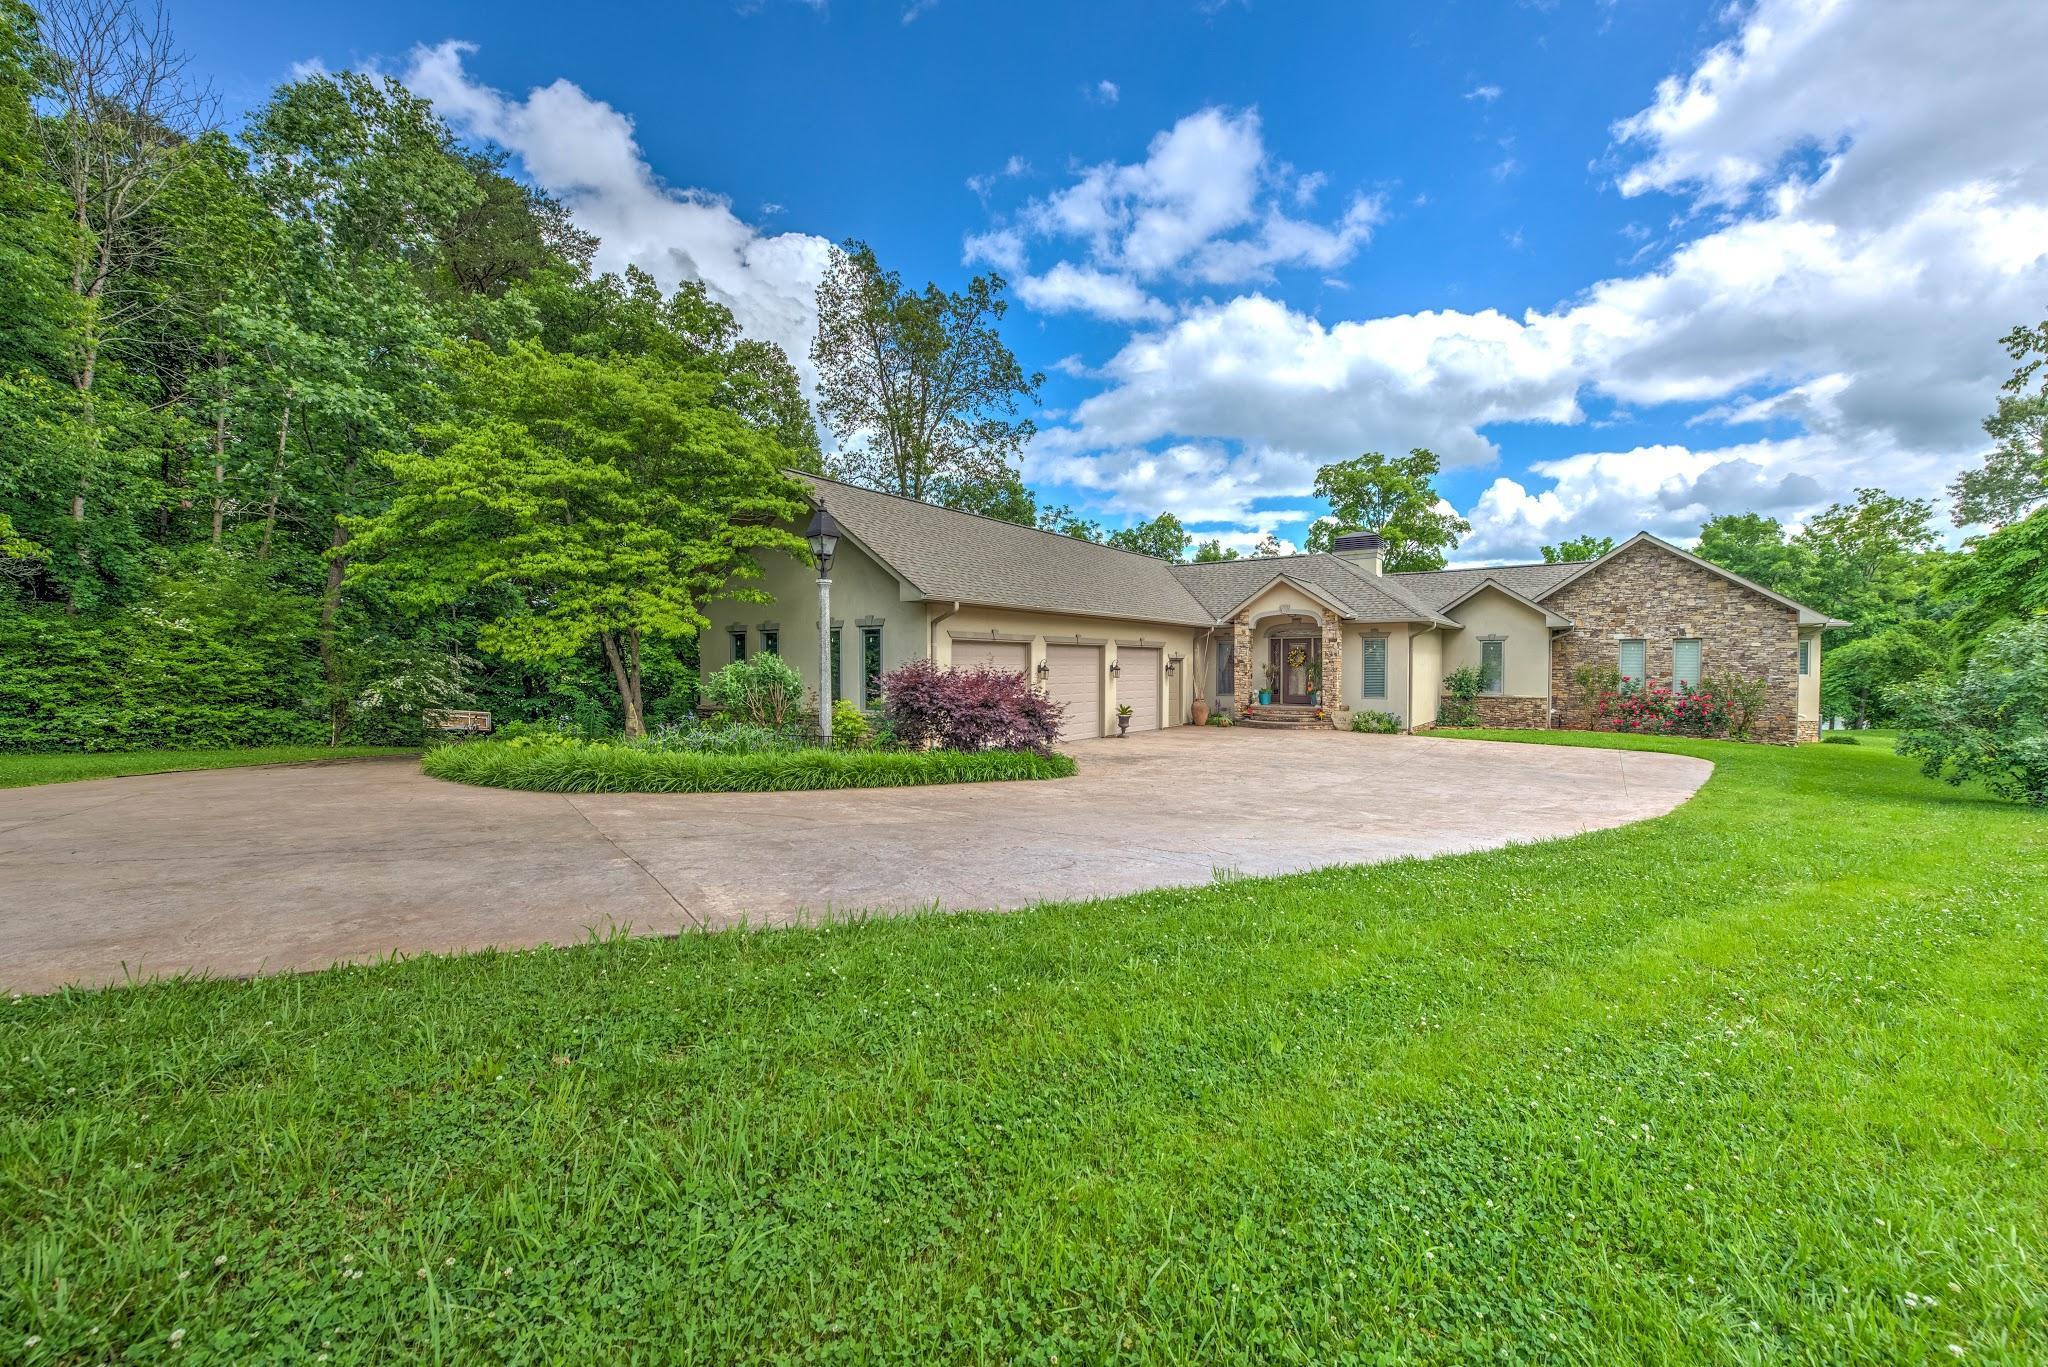 1174 Lake Ridge Drive, Dandridge, Tennessee 37725, 3 Bedrooms Bedrooms, ,3 BathroomsBathrooms,Single Family,For Sale,Lake Ridge,1080414